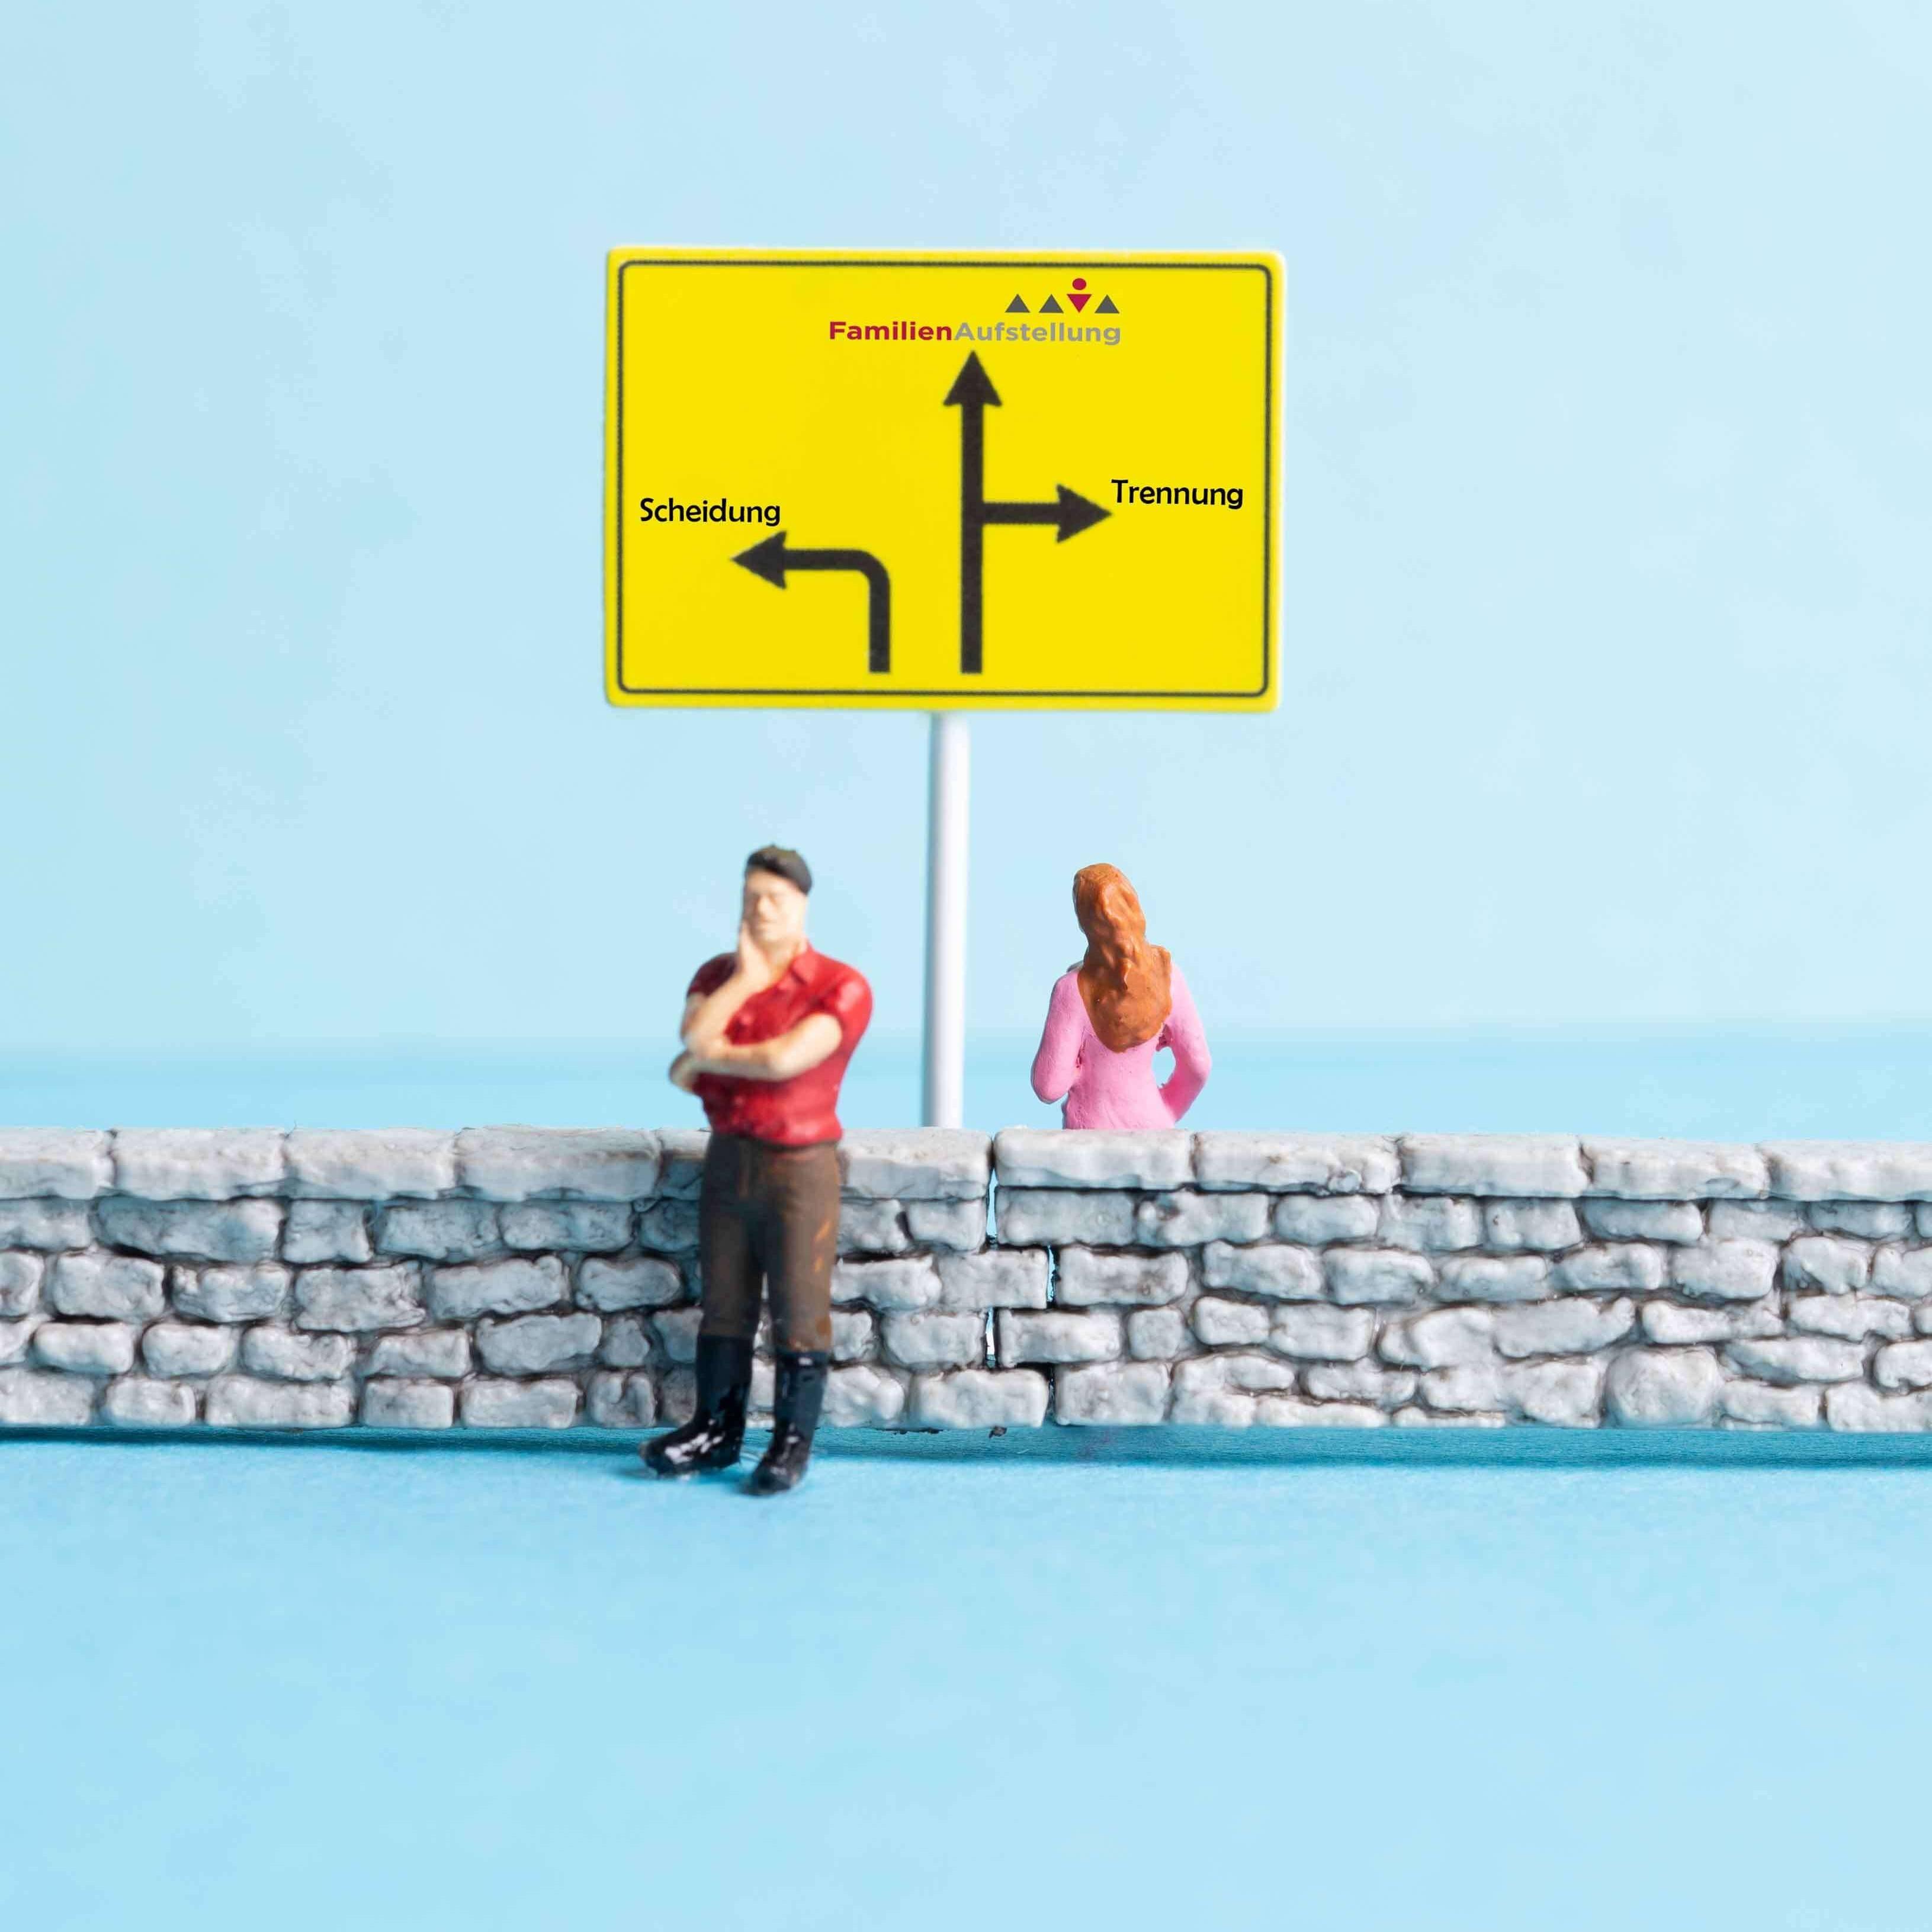 Paarberatung Beziehungsprobleme Paarkonflikt Paarcoaching Paarprobleme